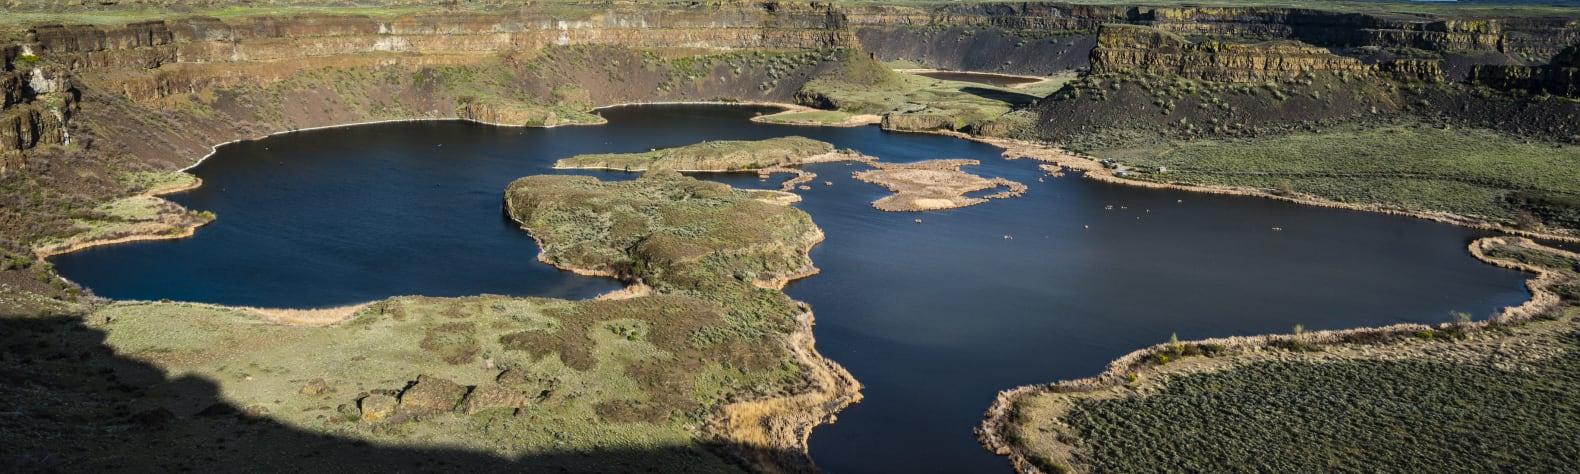 Sun Lakes-Dry Falls State Park